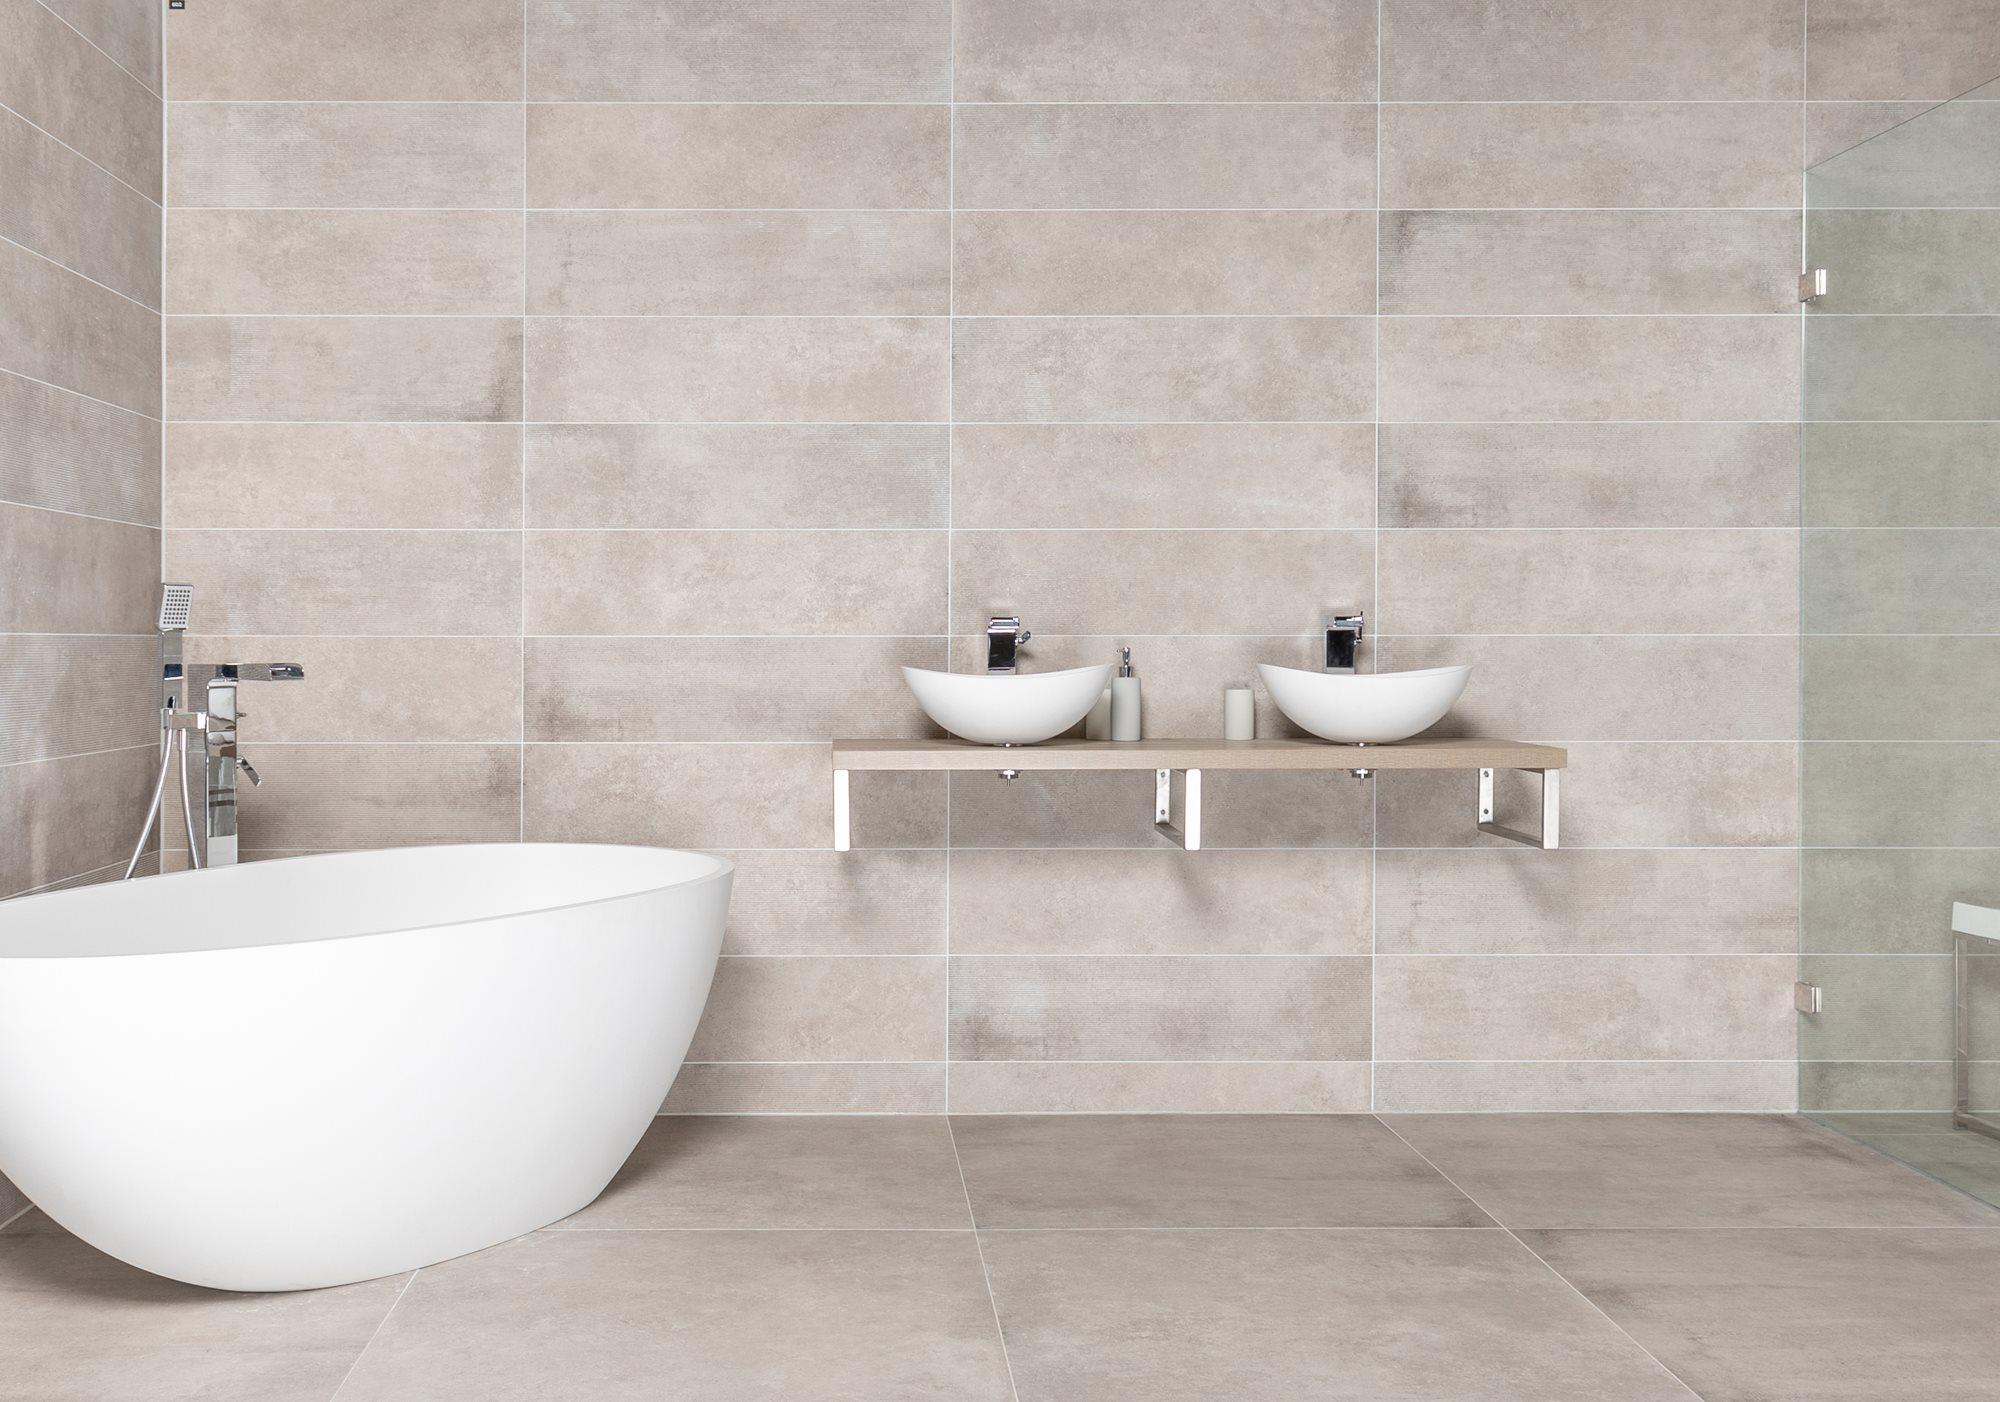 moderne-badkamer-bad-inloopdouche.jpg